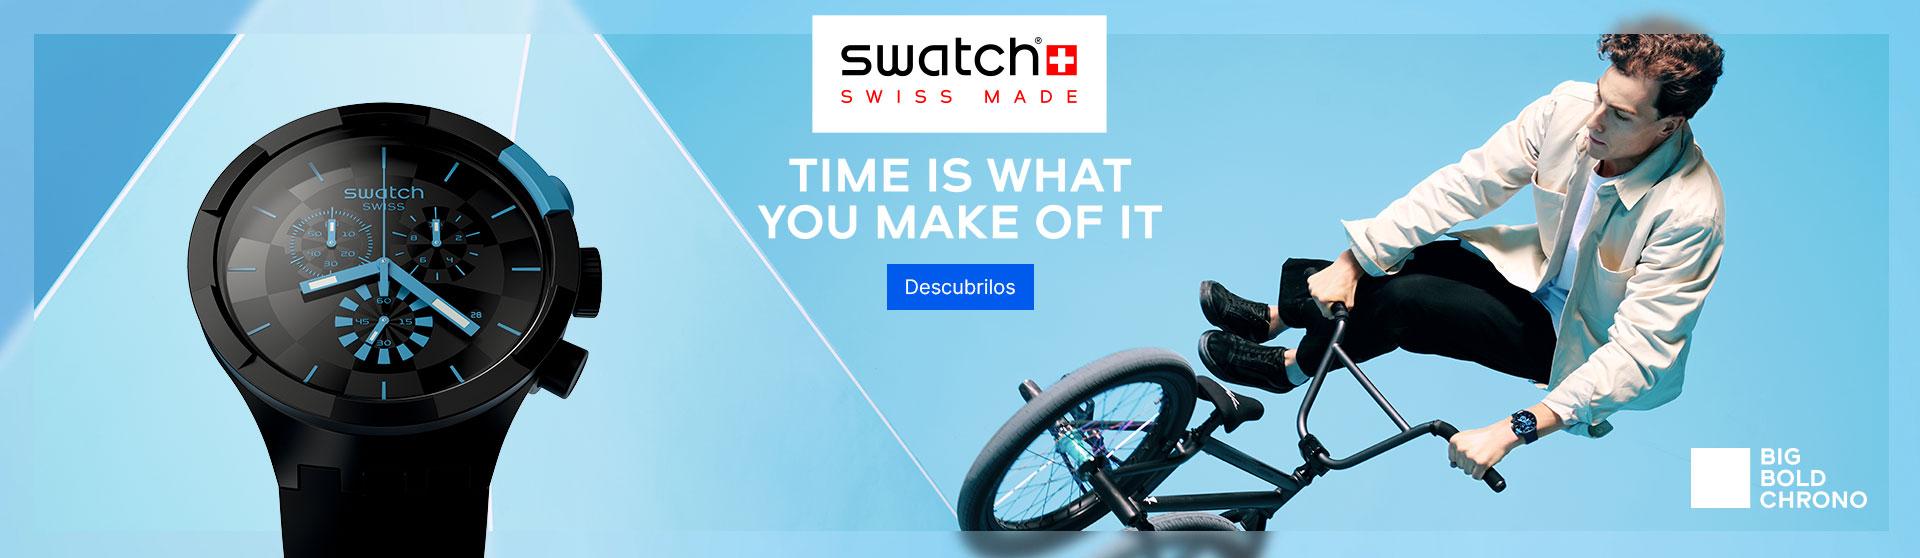 Swatch Big Bold Chrono